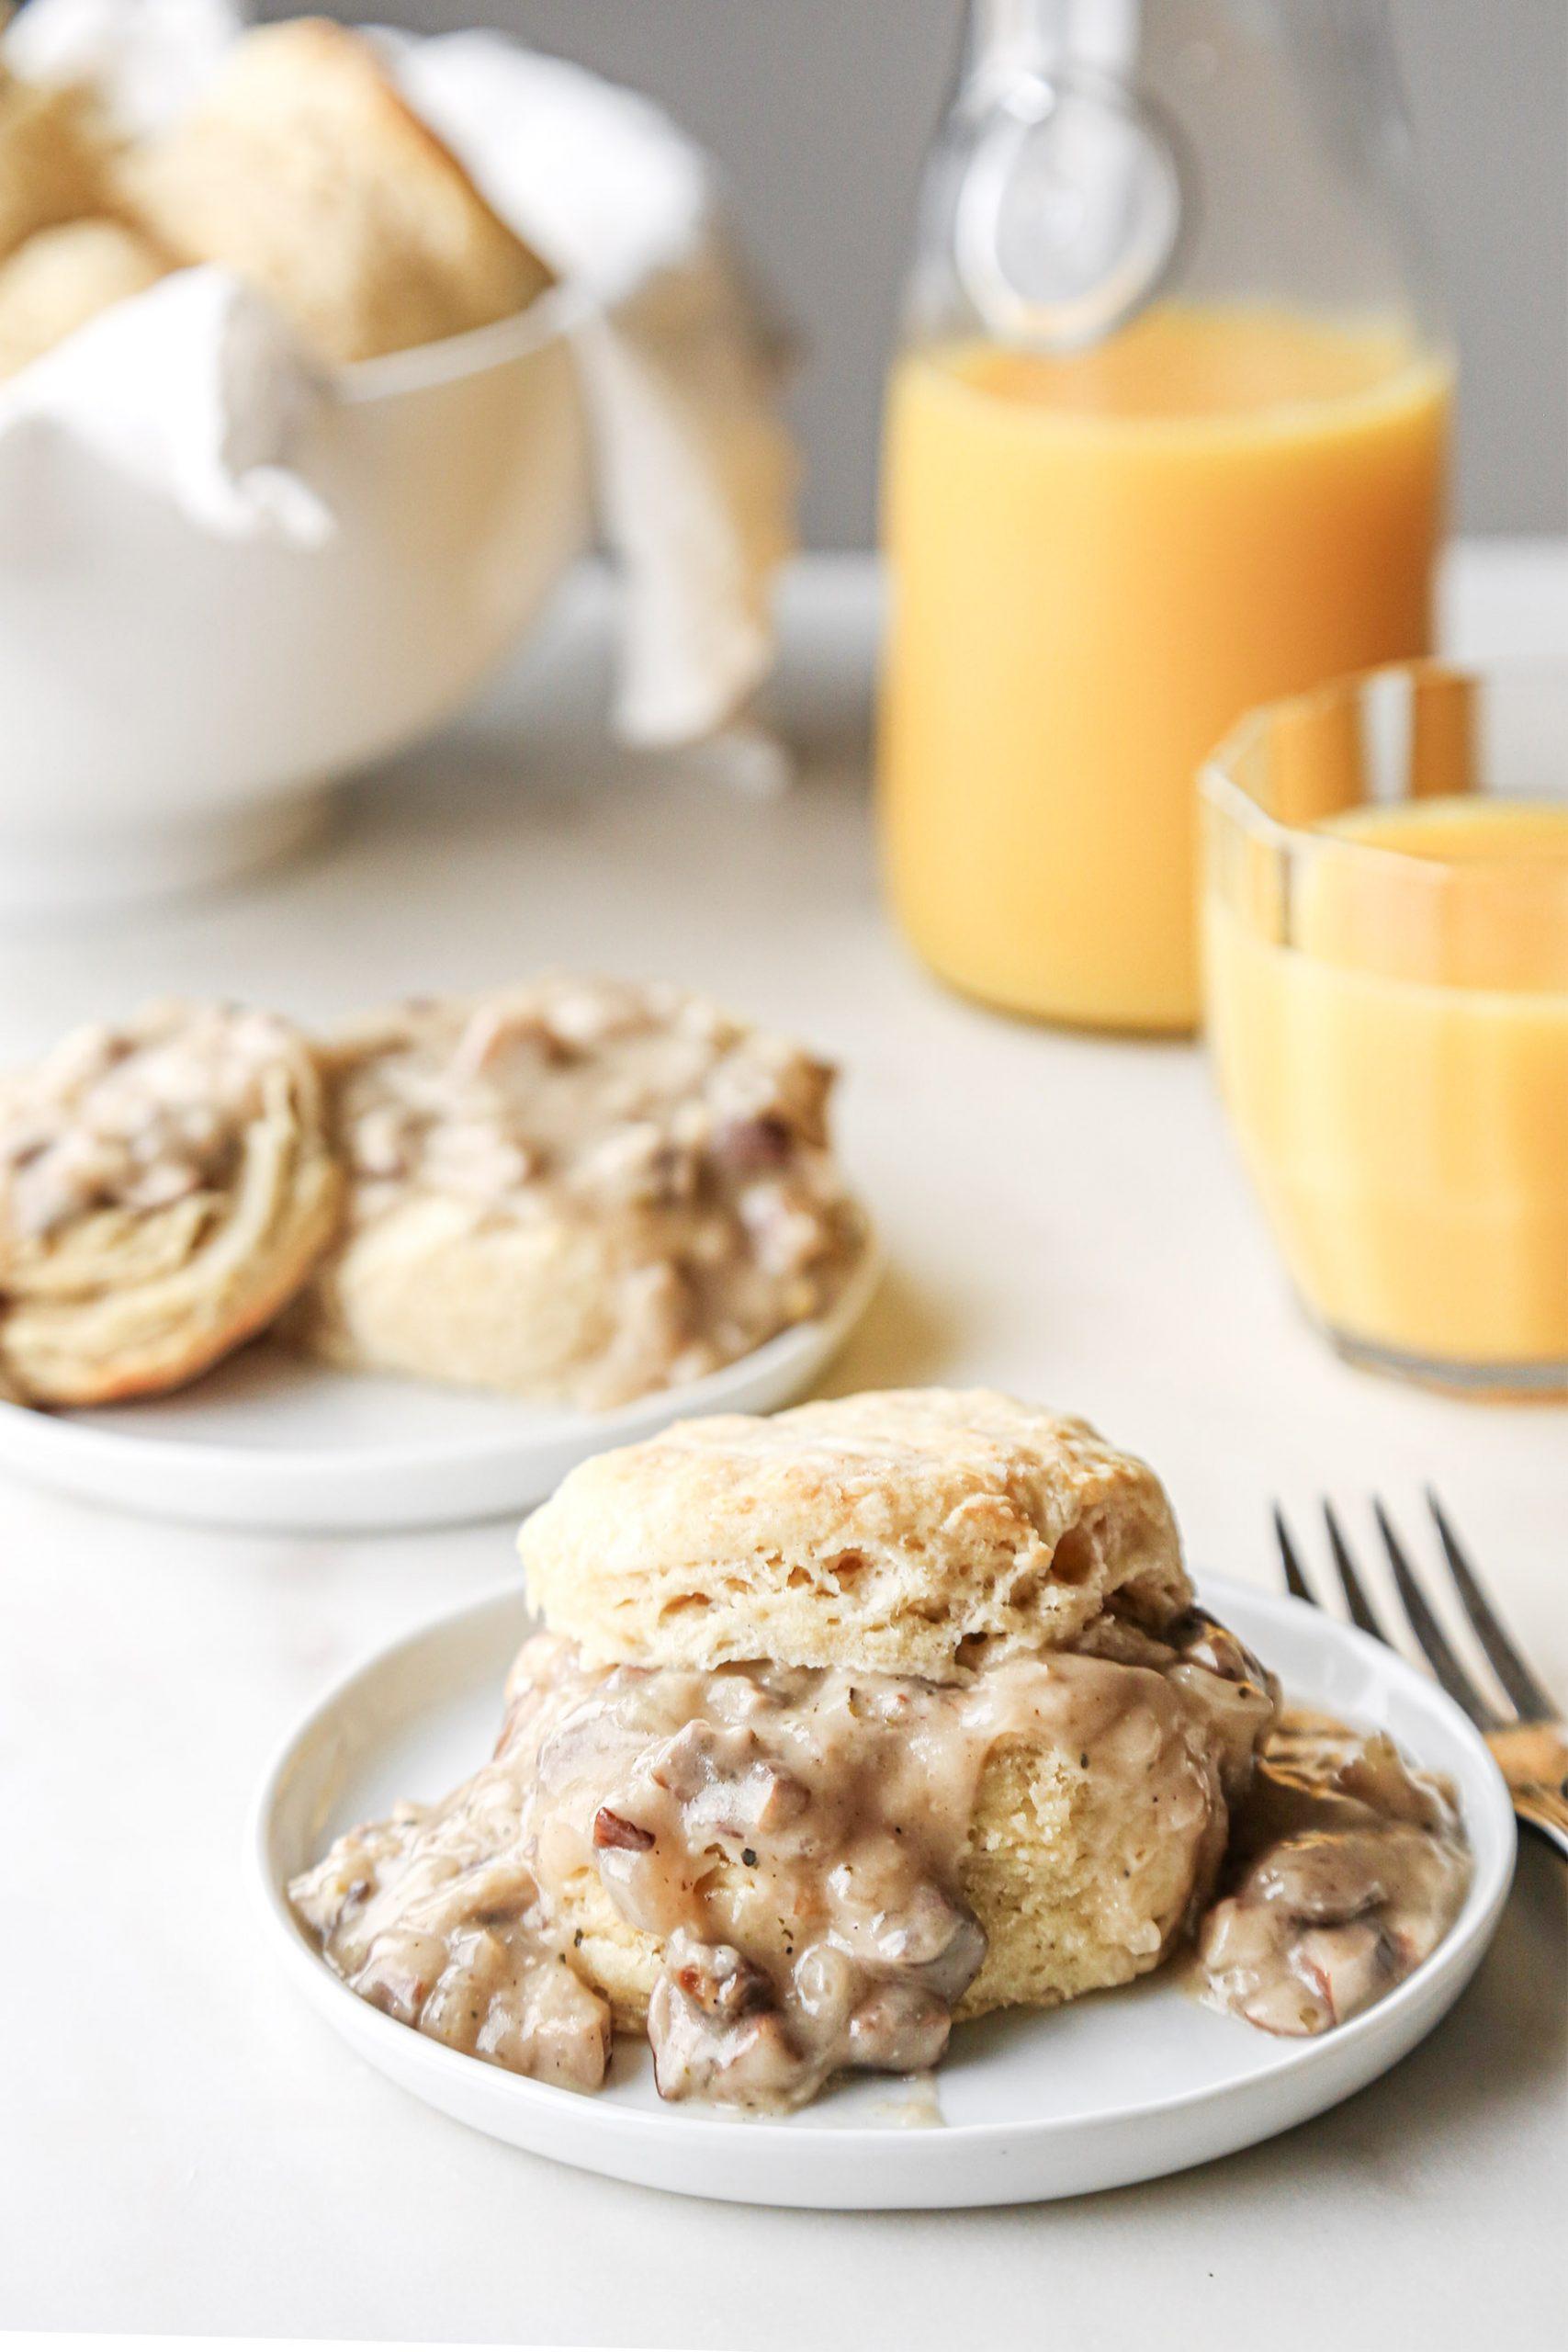 Fluffy Biscuits with Mushroom Gravy   Vegan with Gluten-Free Option